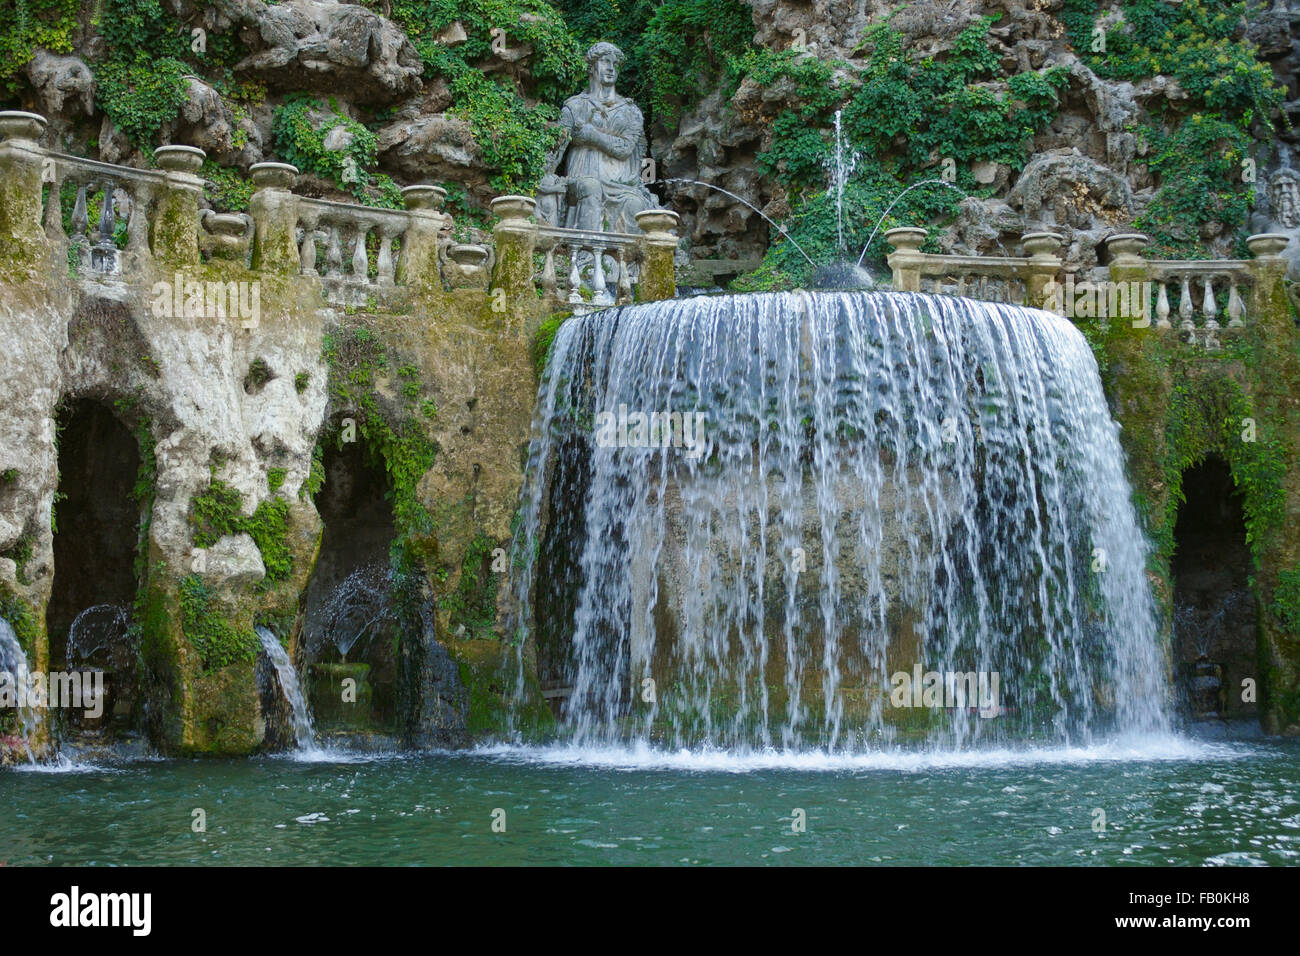 Italy Tivoli Oval Fountain In The Garden Of The Villa